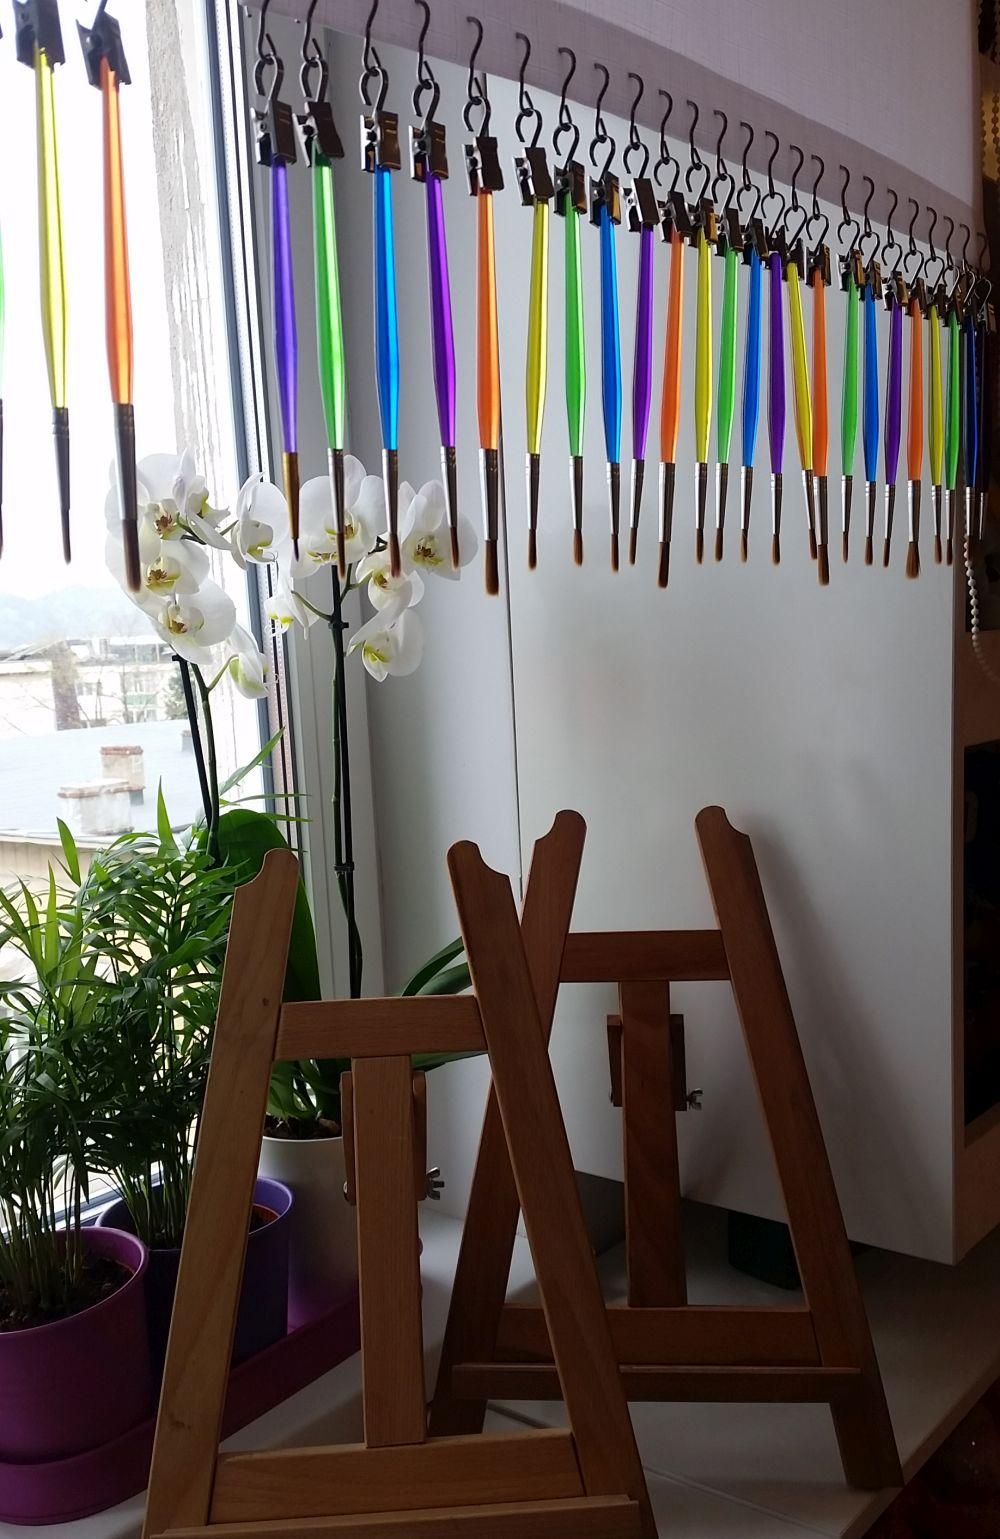 adelaparvu.com despre renovare apartament Campina, Visuri la cheie, episodul 7, sezonul 4, ProTv (4)